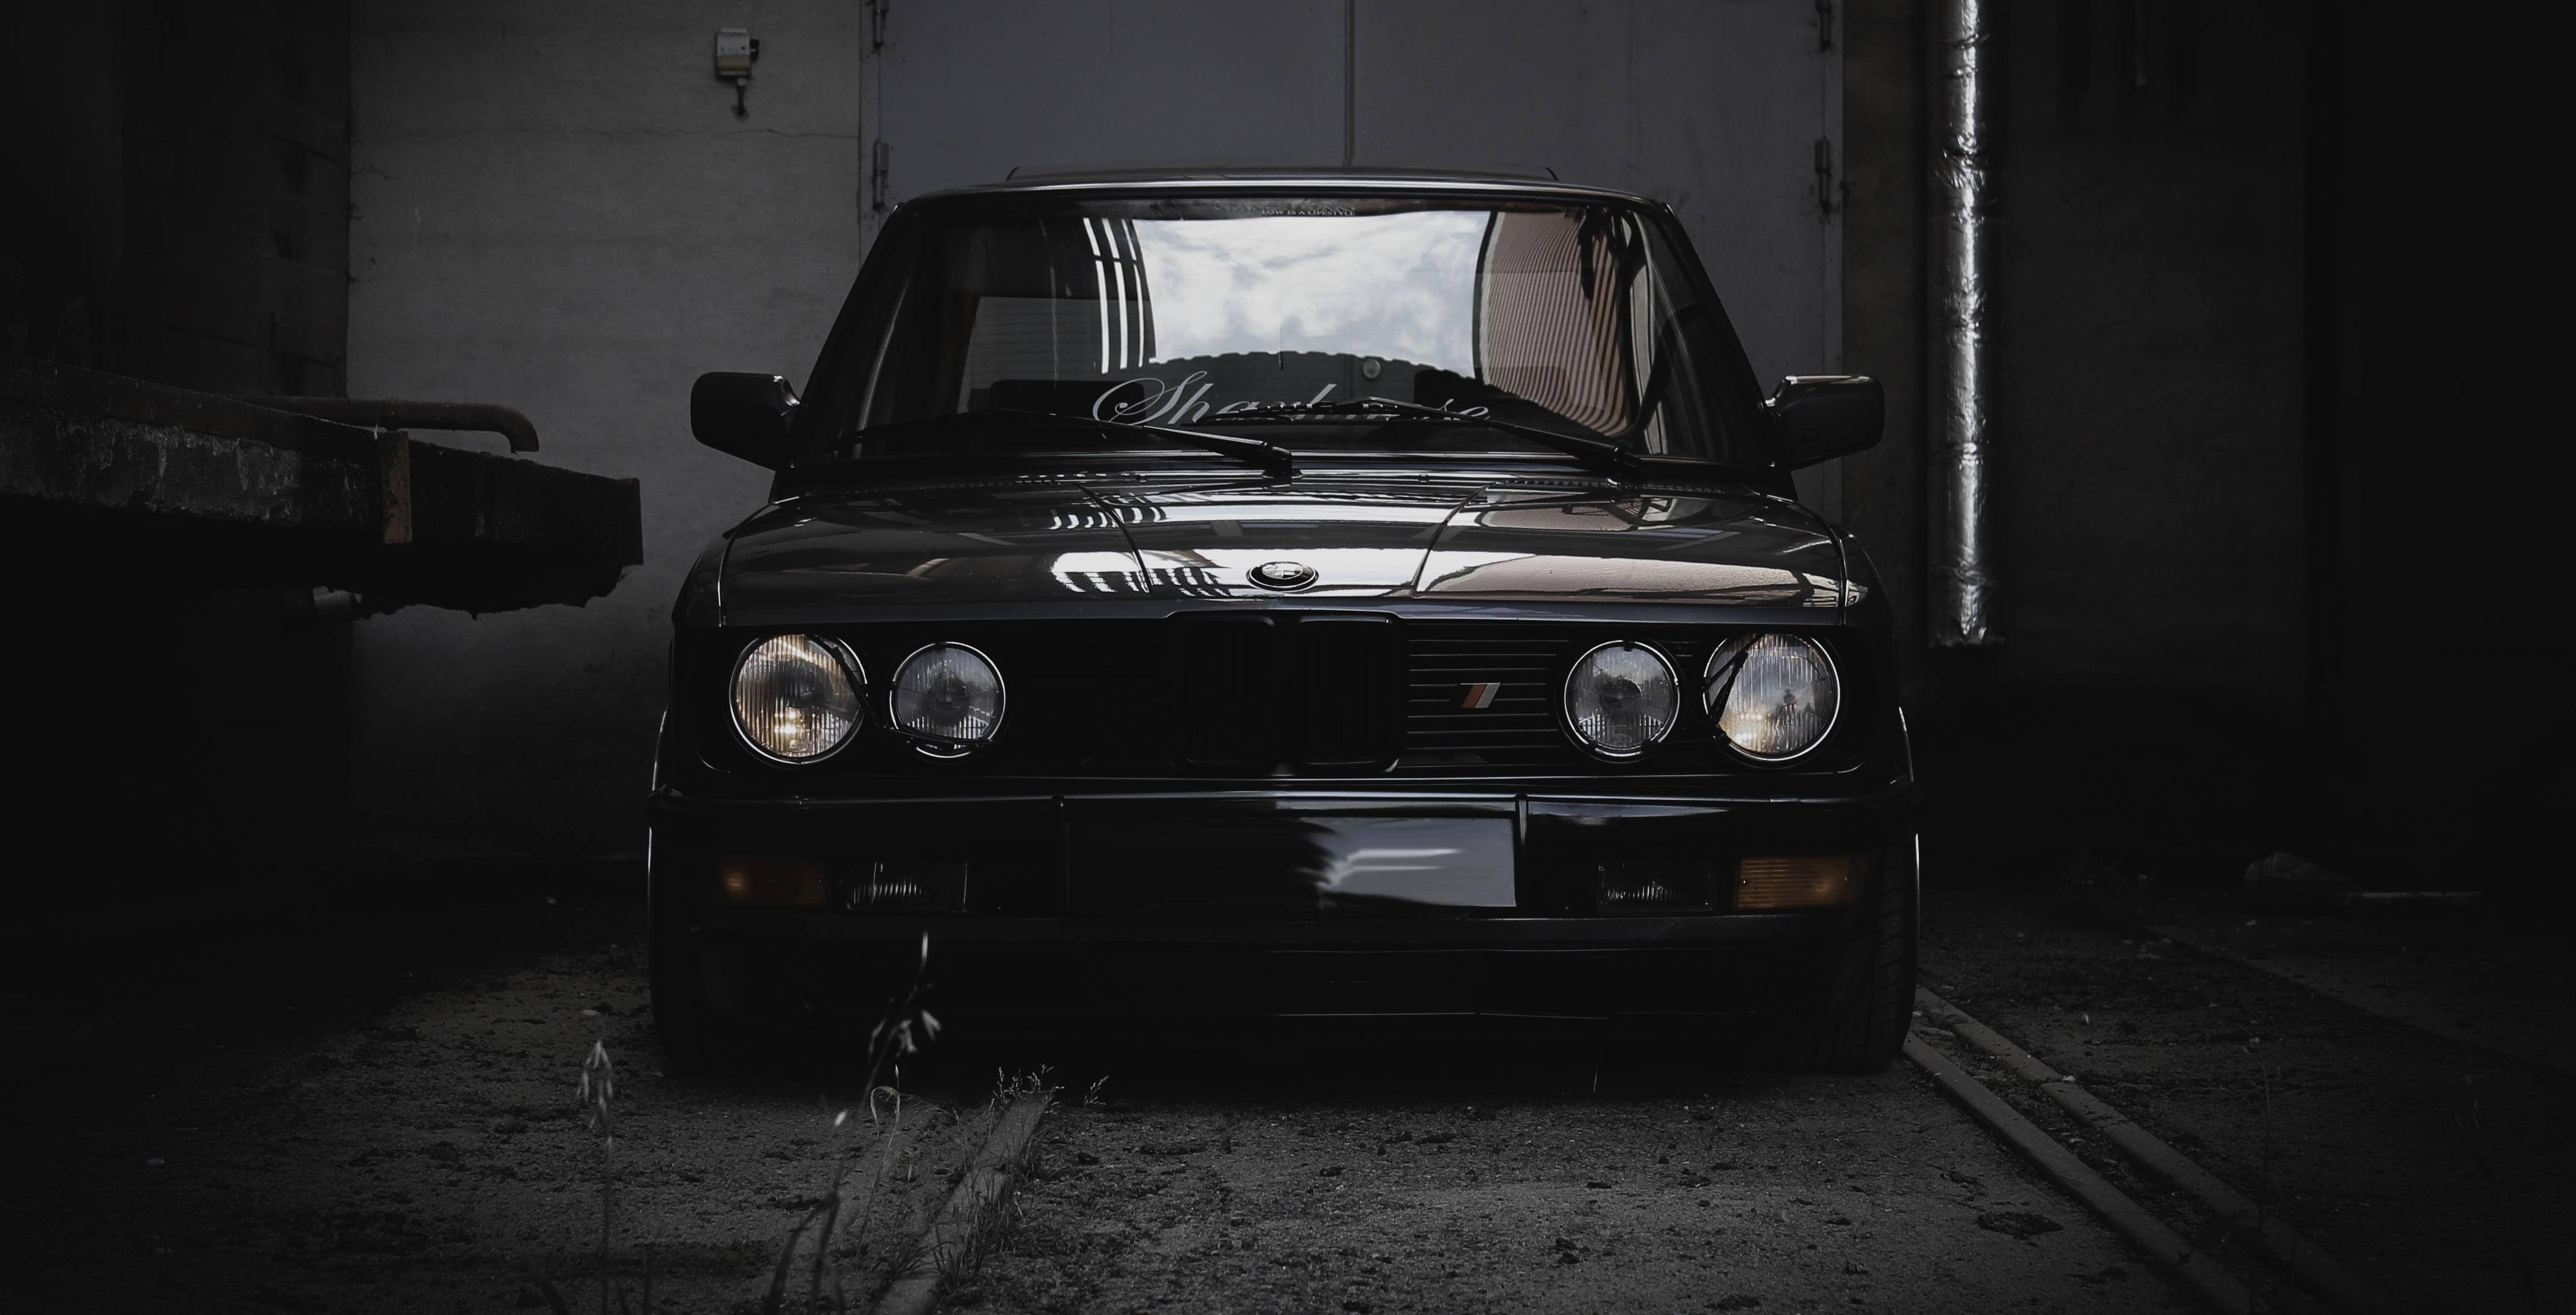 Black car BMW E28 Squatty Norway HD wallpaper Wallpaper Flare 4272x2180